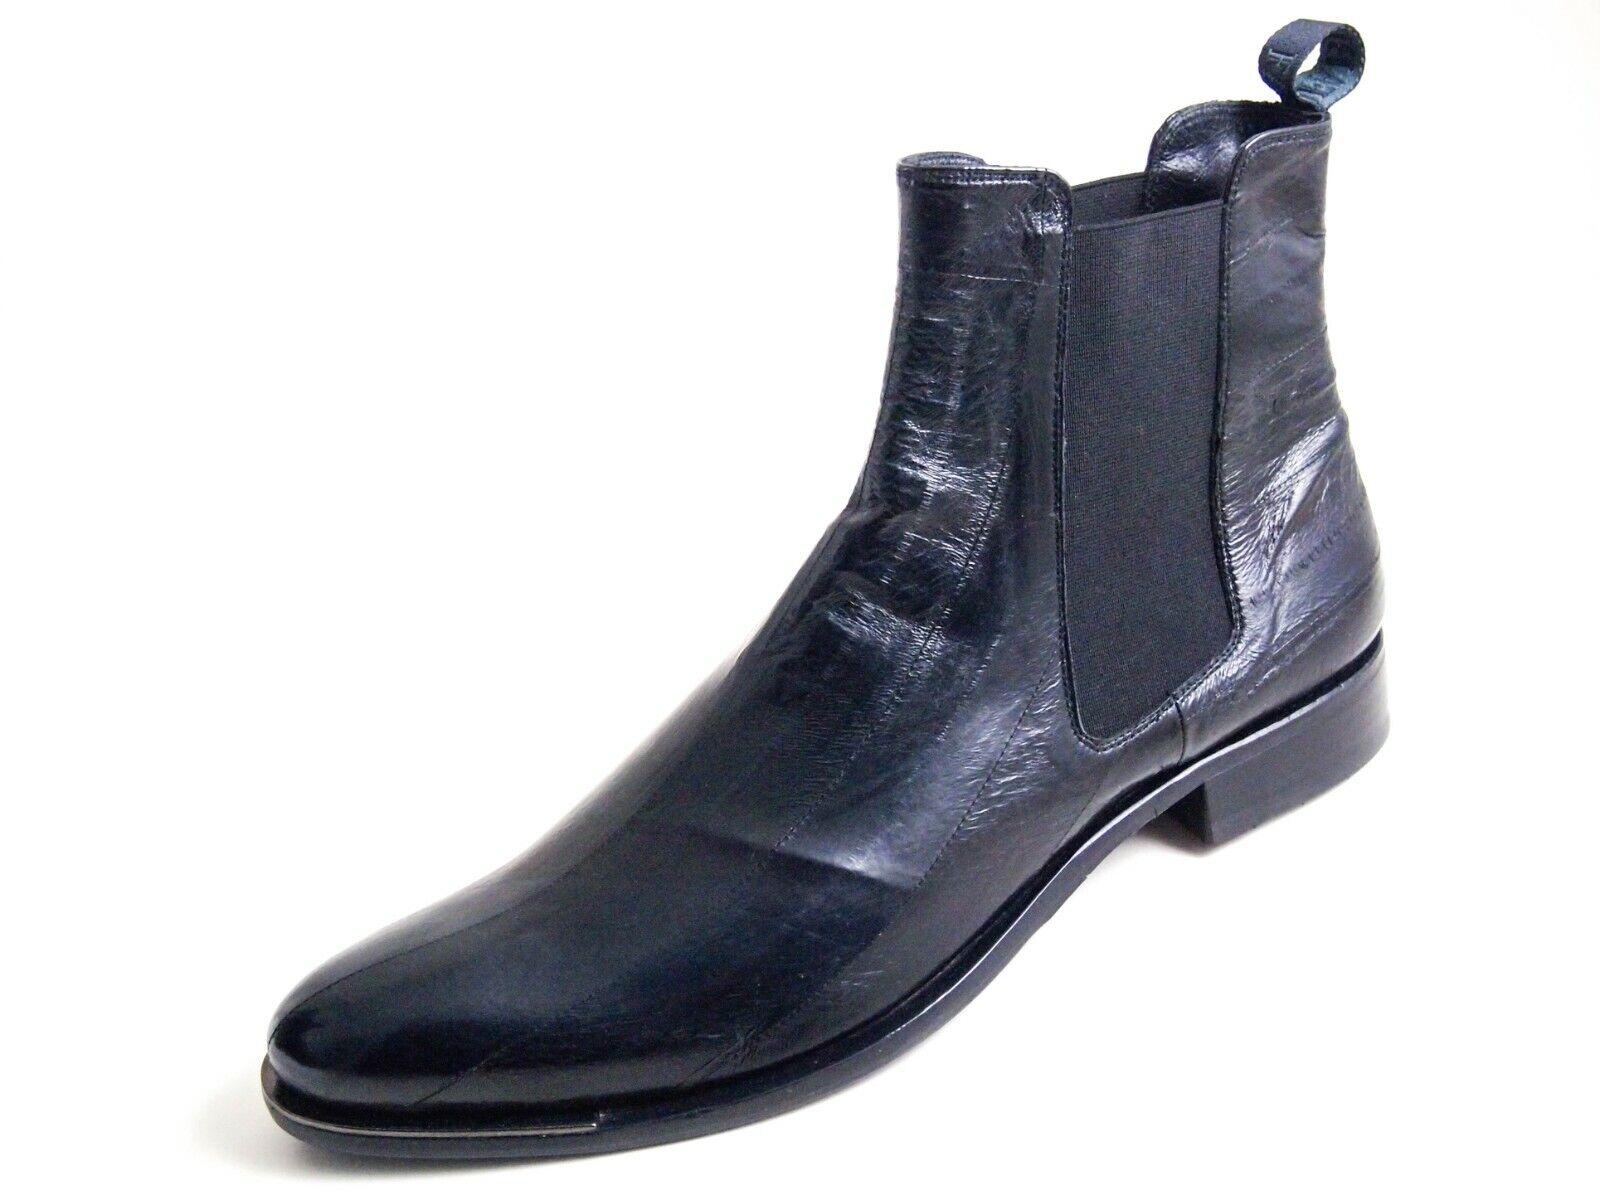 Fabi Chelsea Ankle Boots Black Eel Skin Leather Men Size UK 9 EU 43